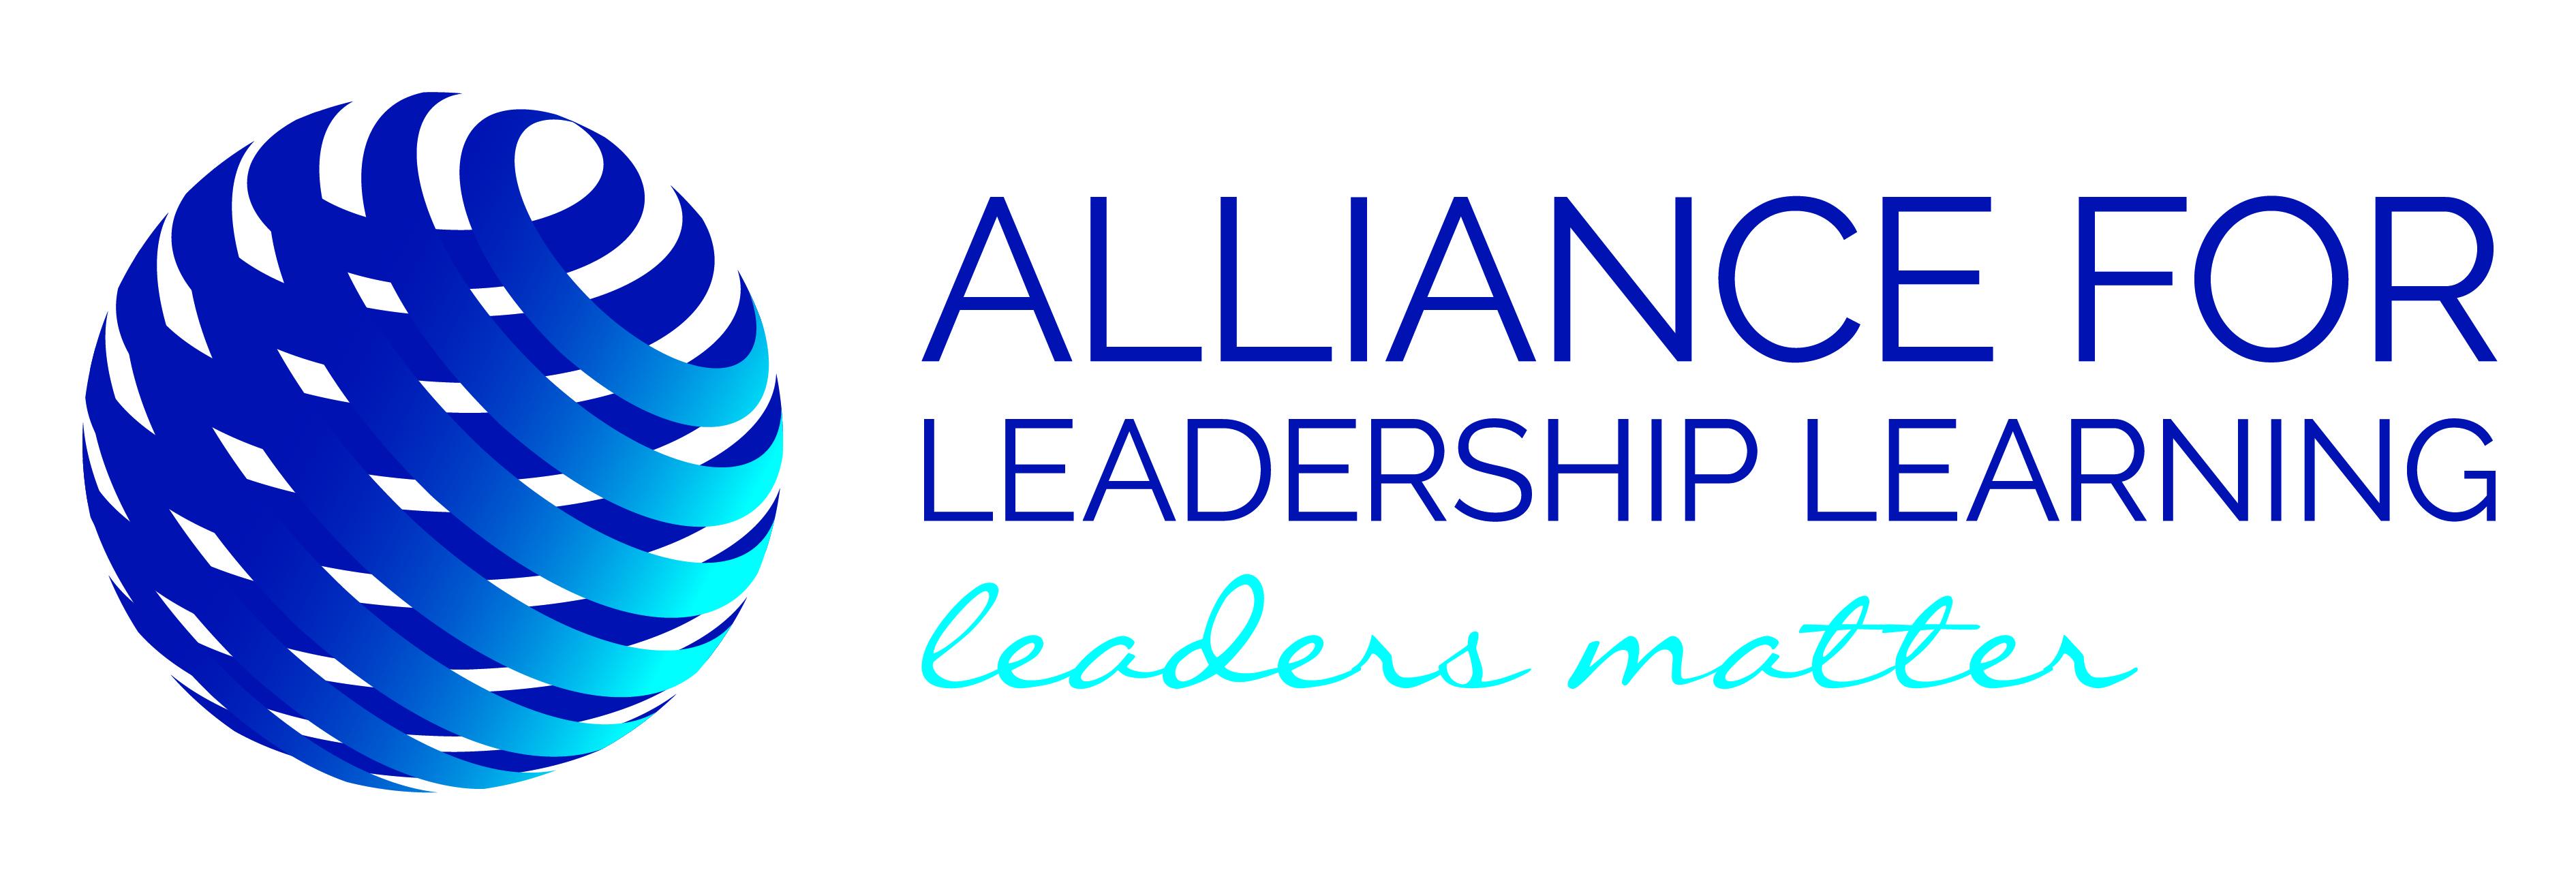 Alliance for Leadership Learning